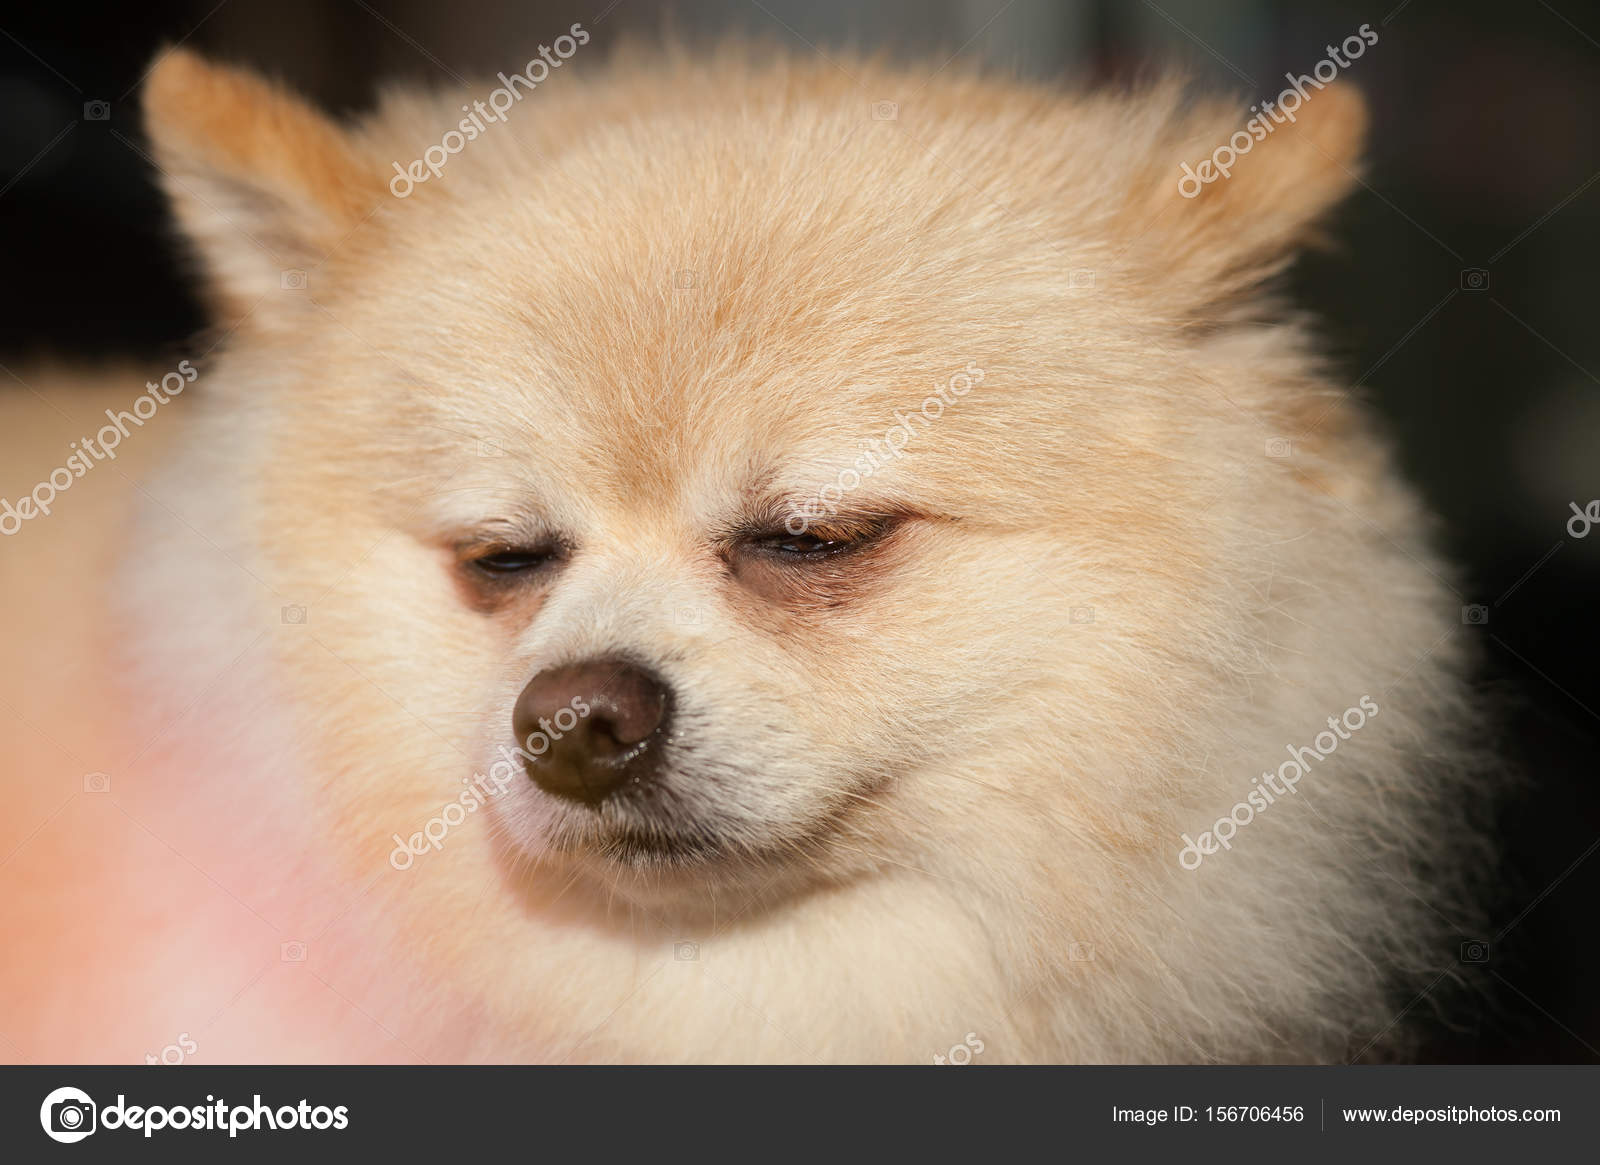 Best Pom Canine Adorable Dog - depositphotos_156706456-stock-photo-fluffy-pom-pomeranian-cute-dog  Collection_748740  .jpg